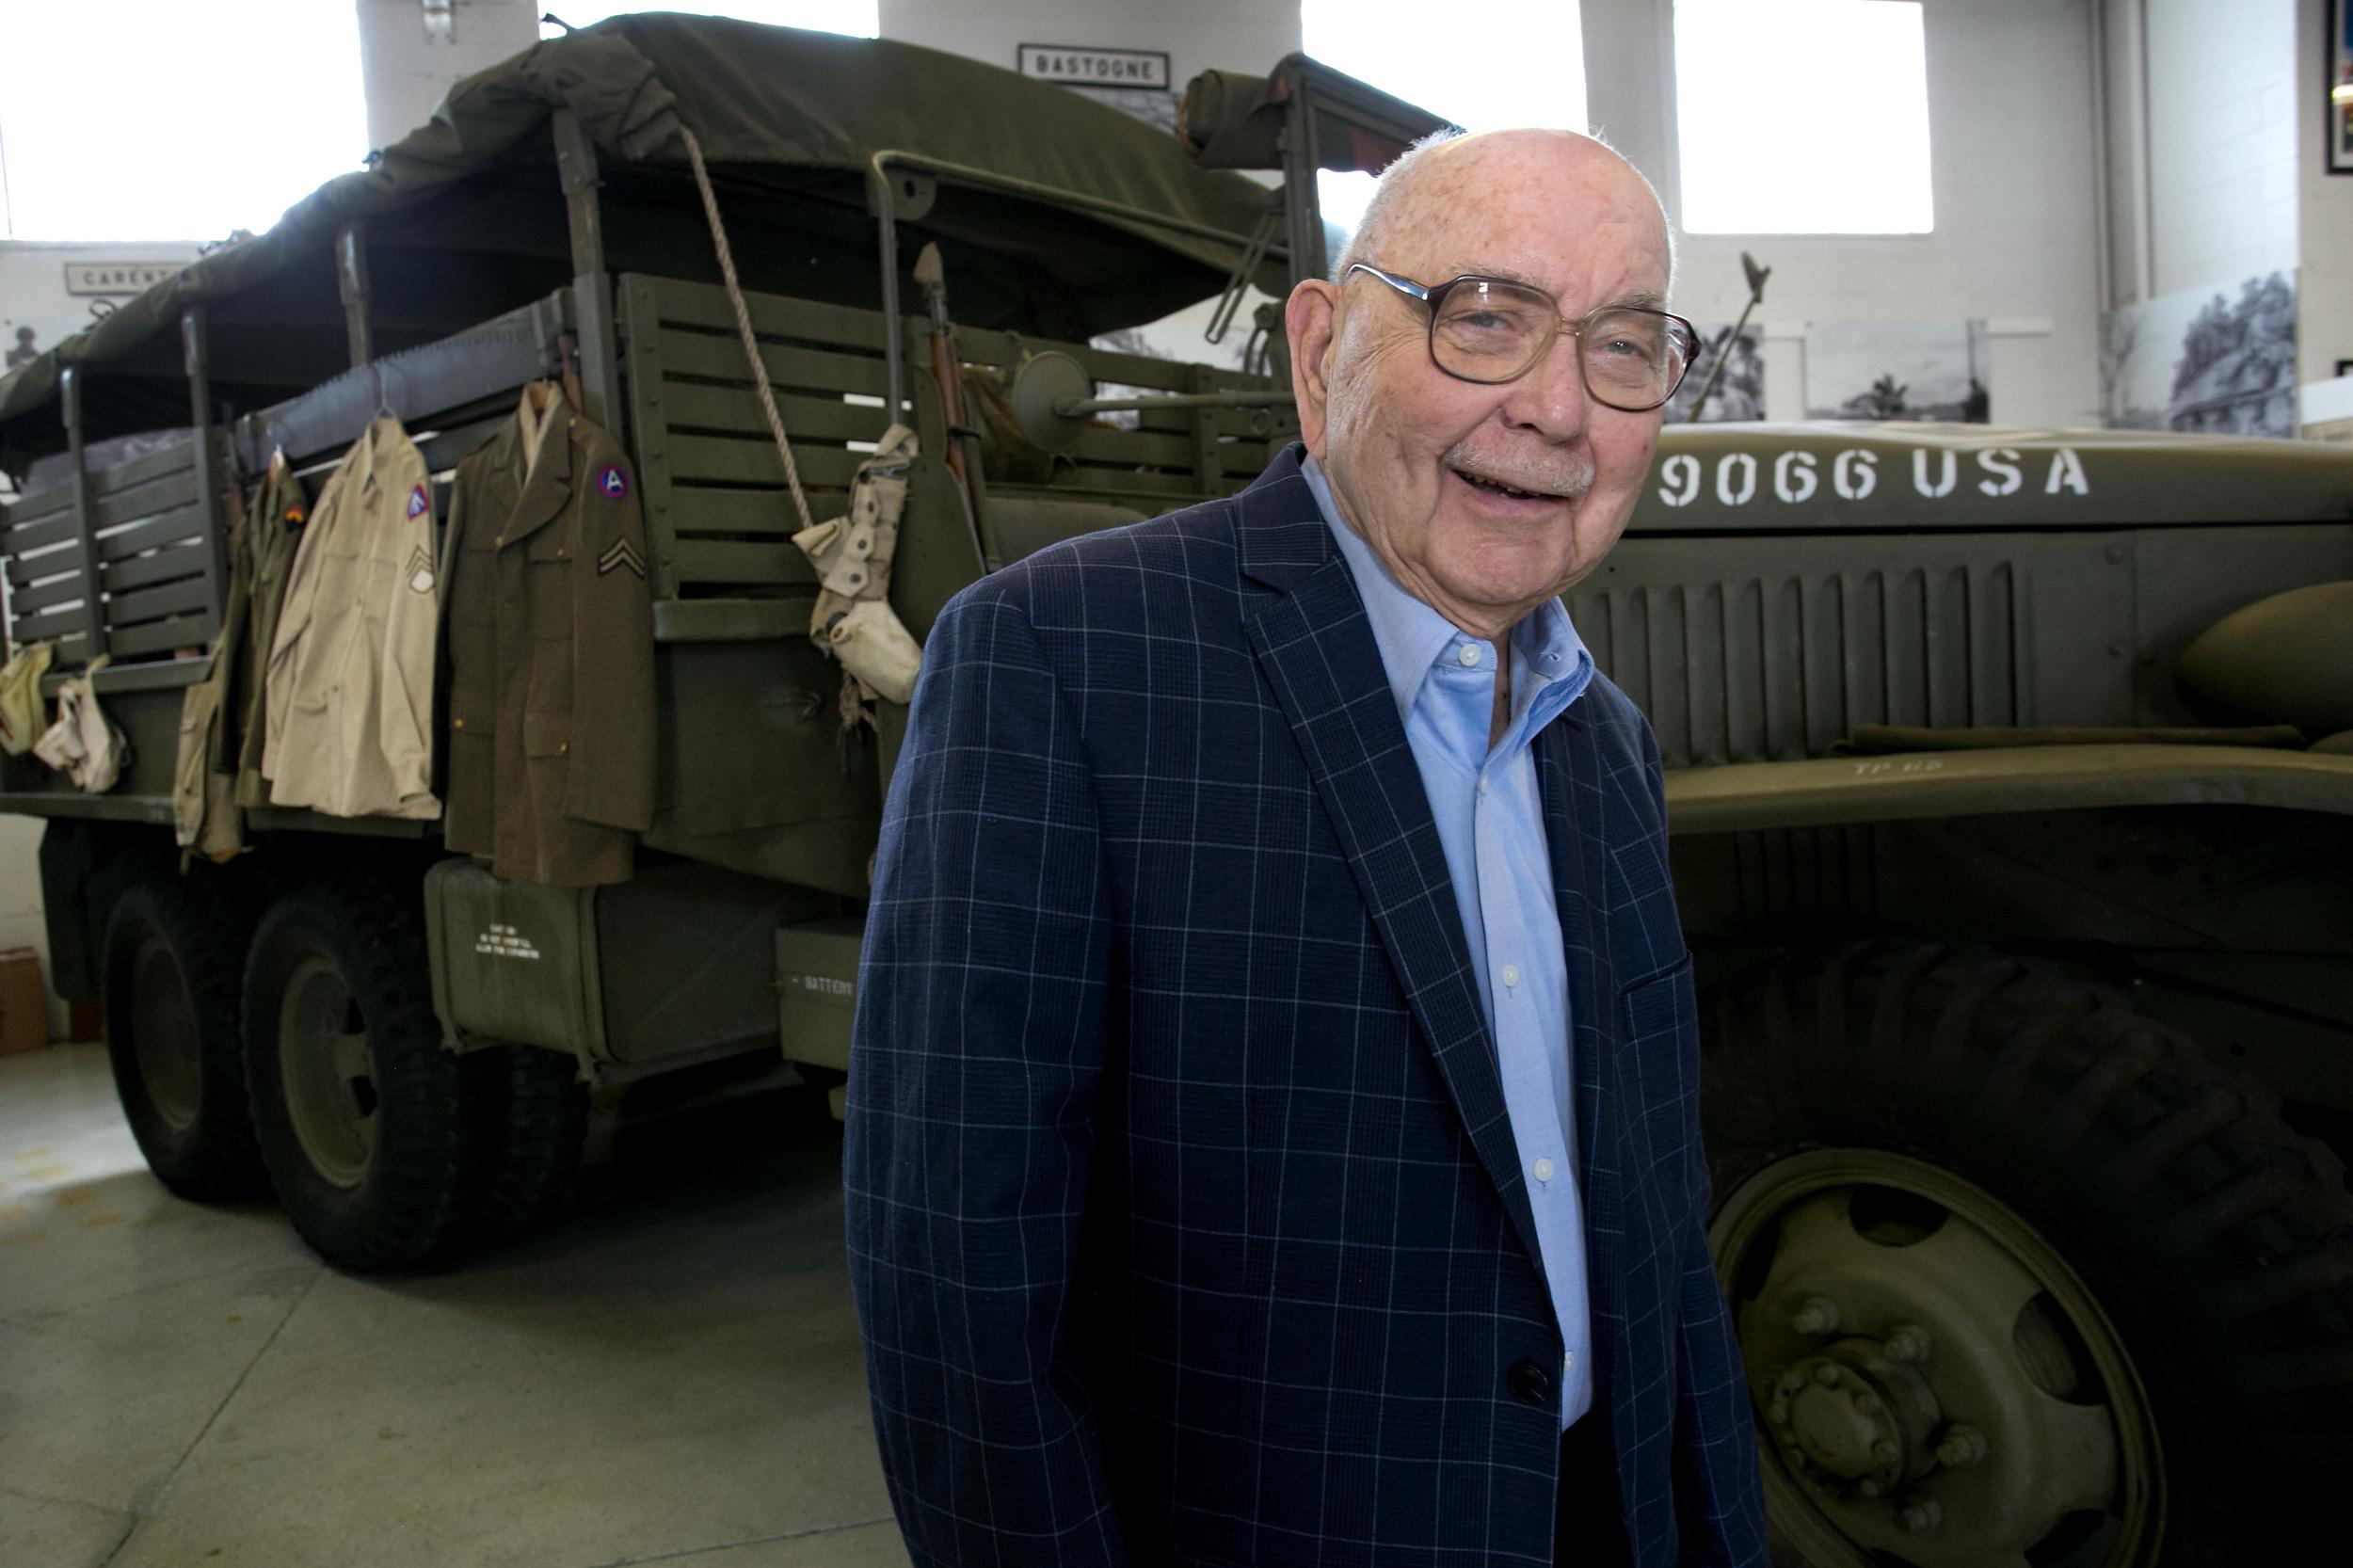 Bob smiling by truck.jpg